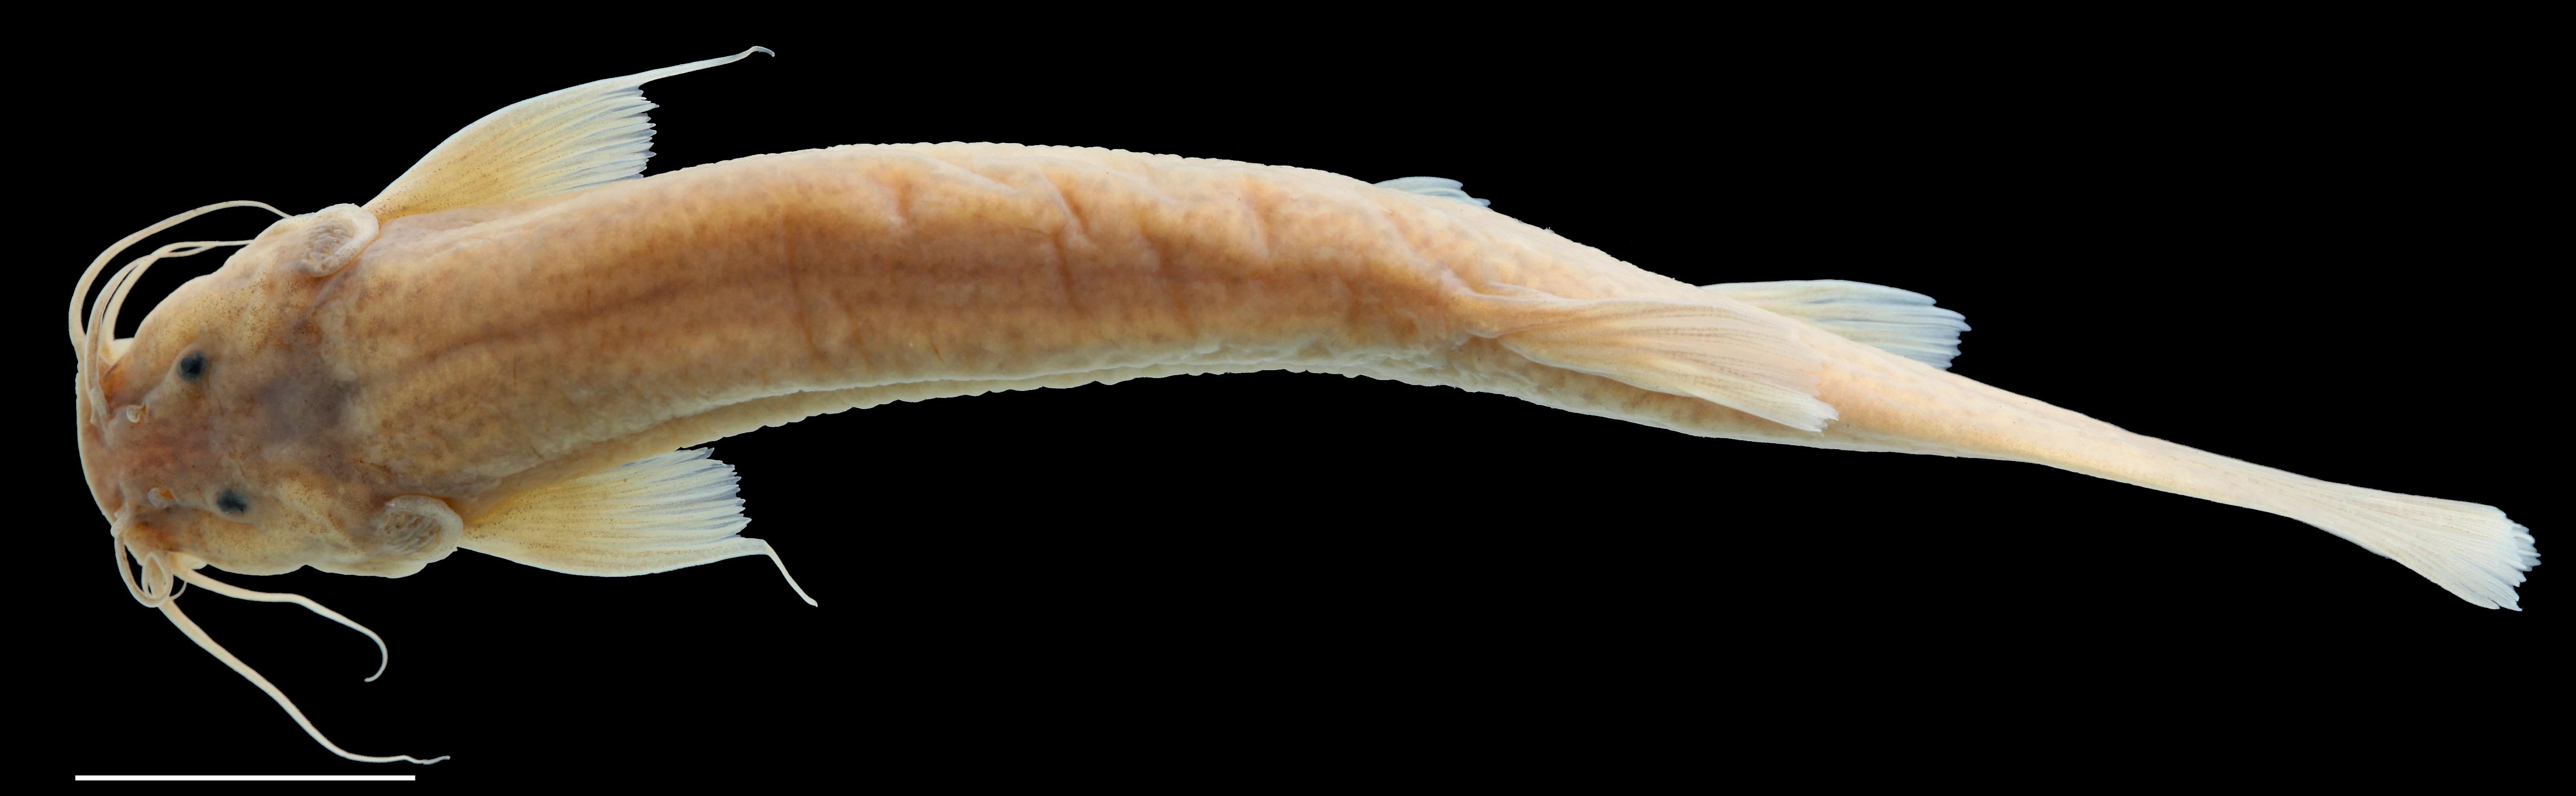 Paratype of <em>Trichomycterus tetuanensis</em>, IAvH-P-12753_Dorsal, 67.6 mm SL (scale bar = 1 cm). Photograph by C. DoNascimiento.